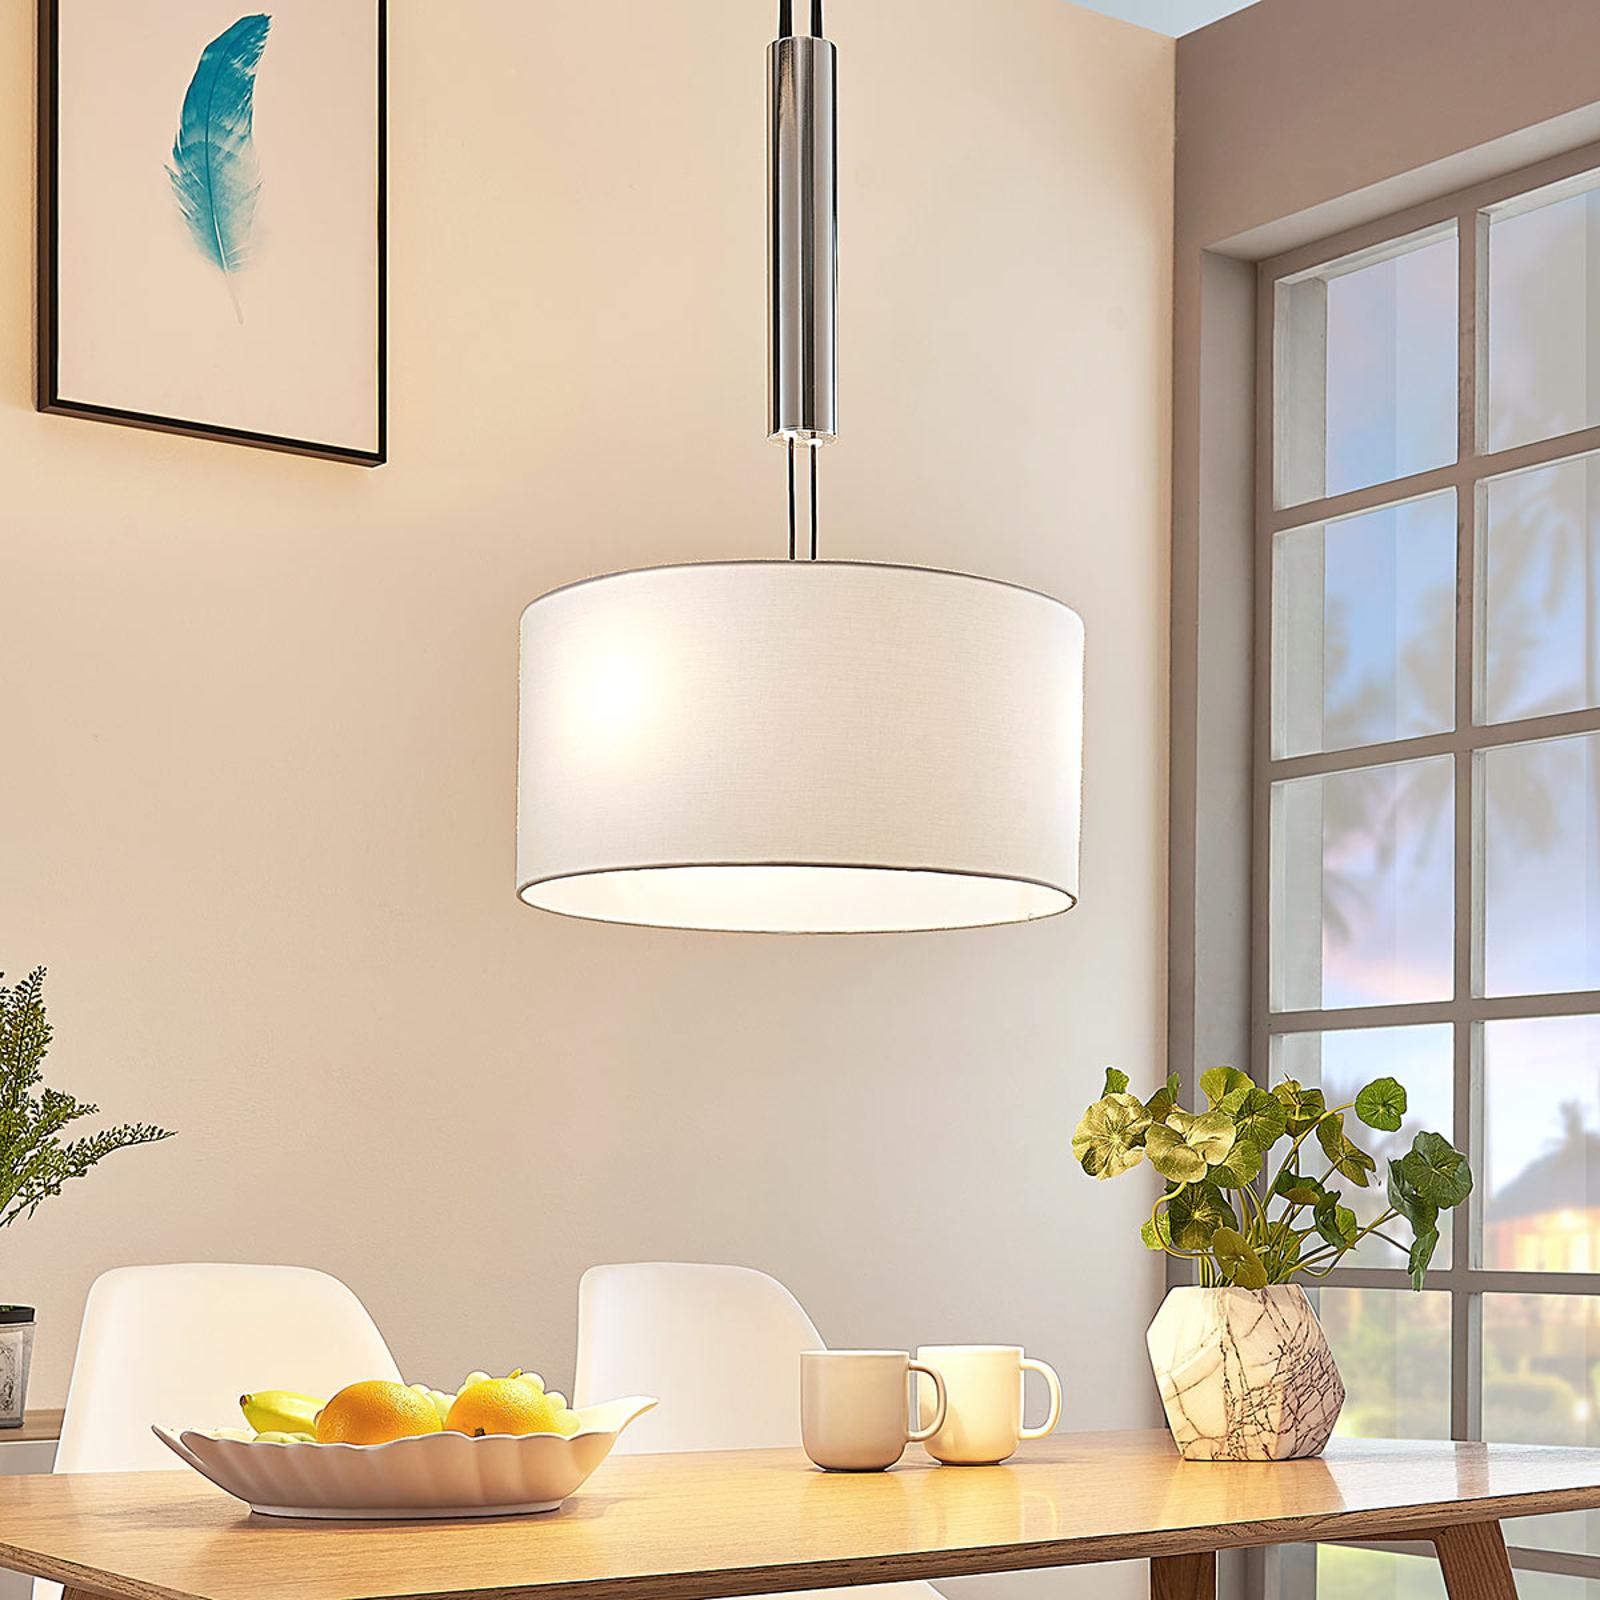 Stoffen hanglamp Mariat, hoogte verstelbaar, rond